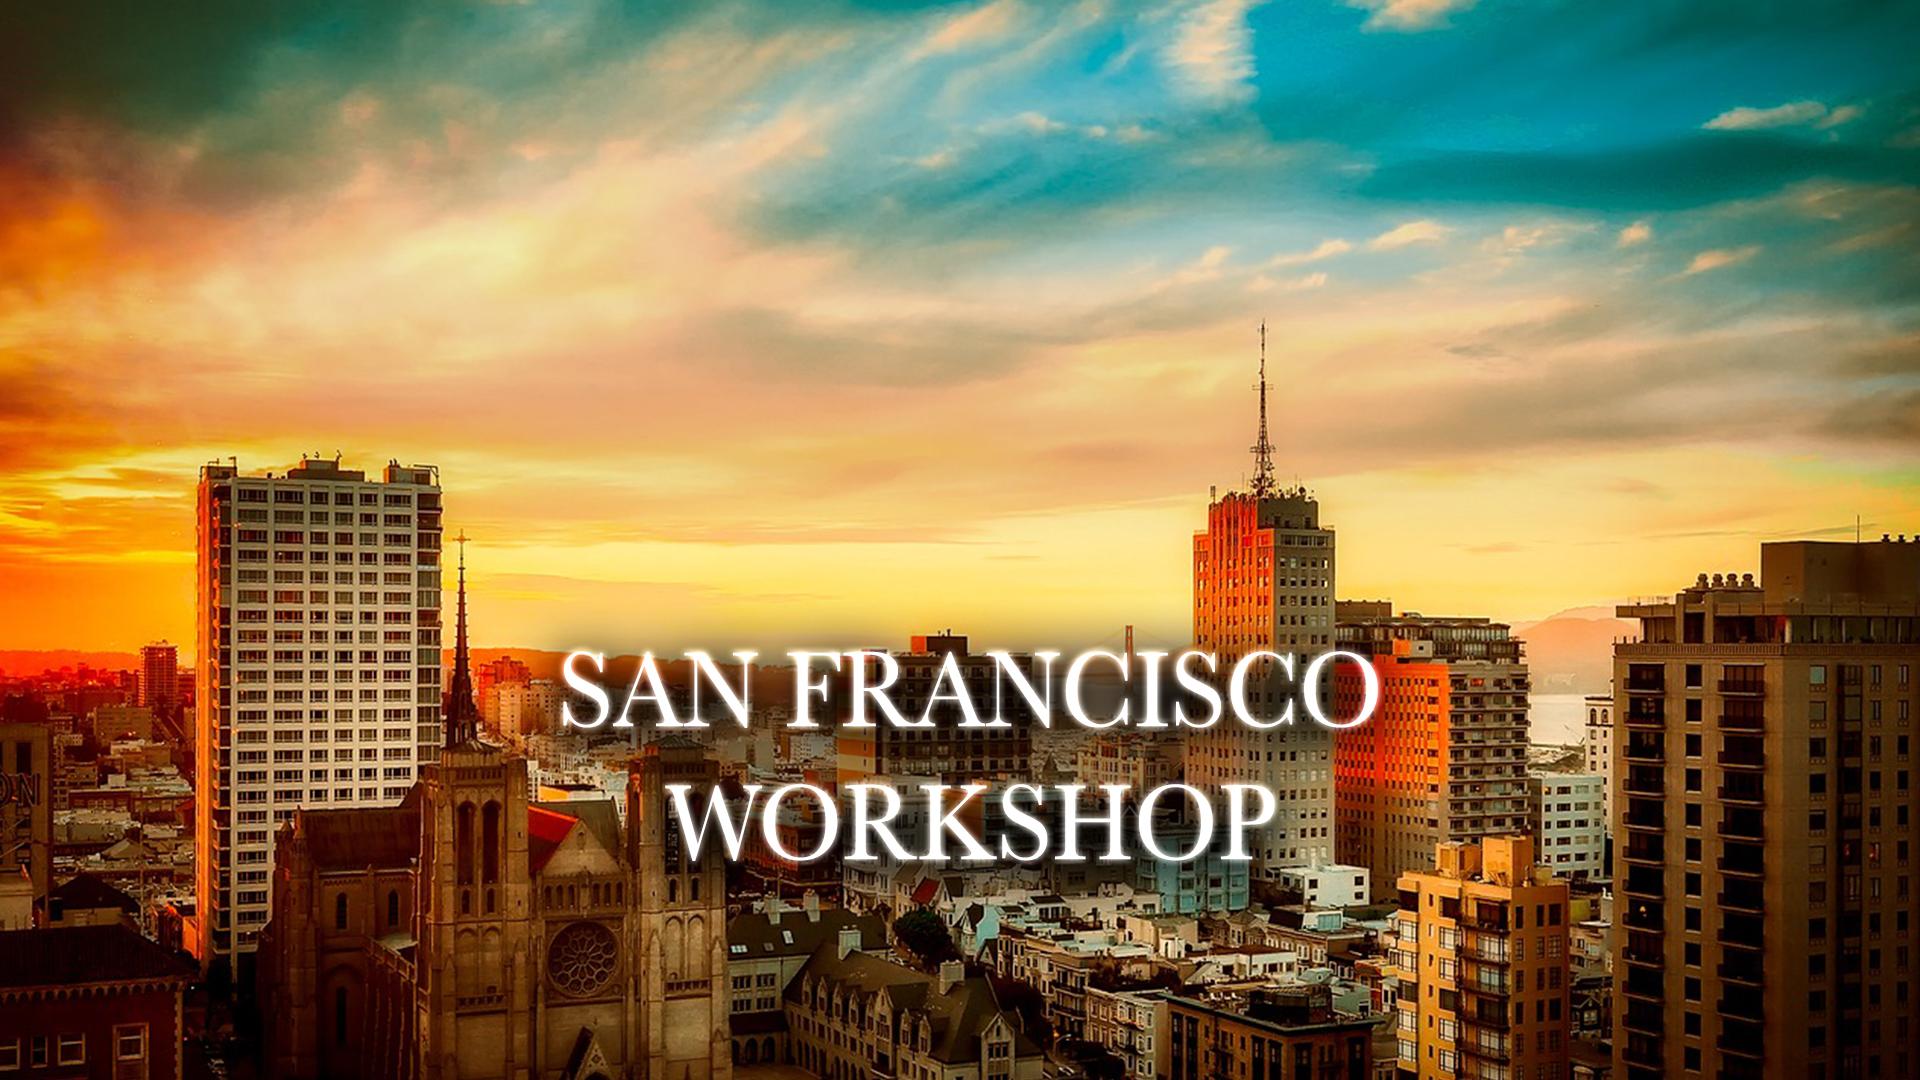 San Francisco leica workshop